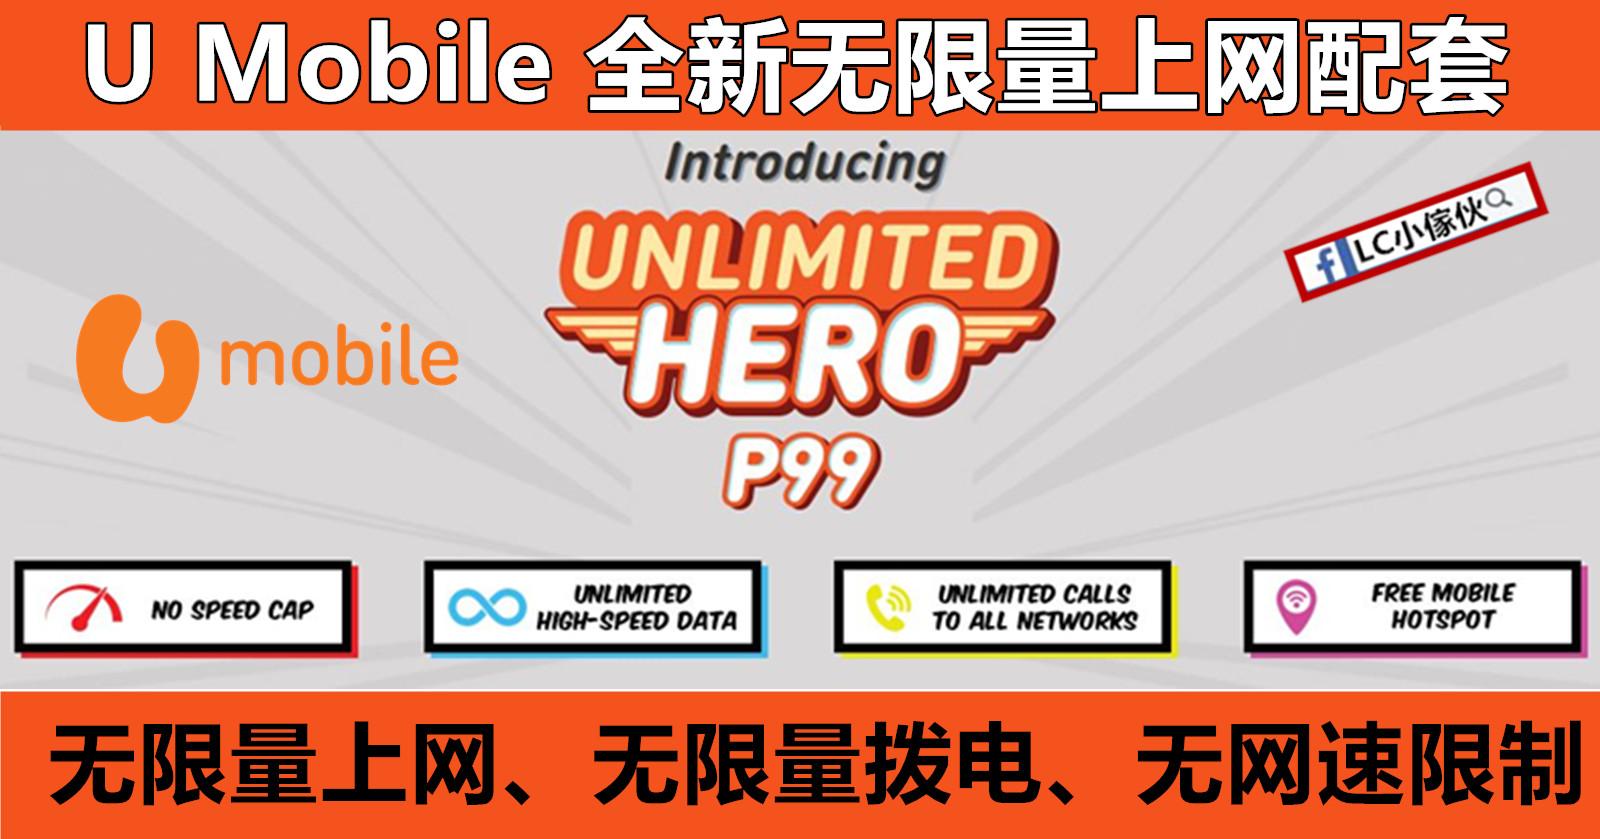 U Mobile Unlimited HERO P99 无限量上网配套| LC 小傢伙綜合網